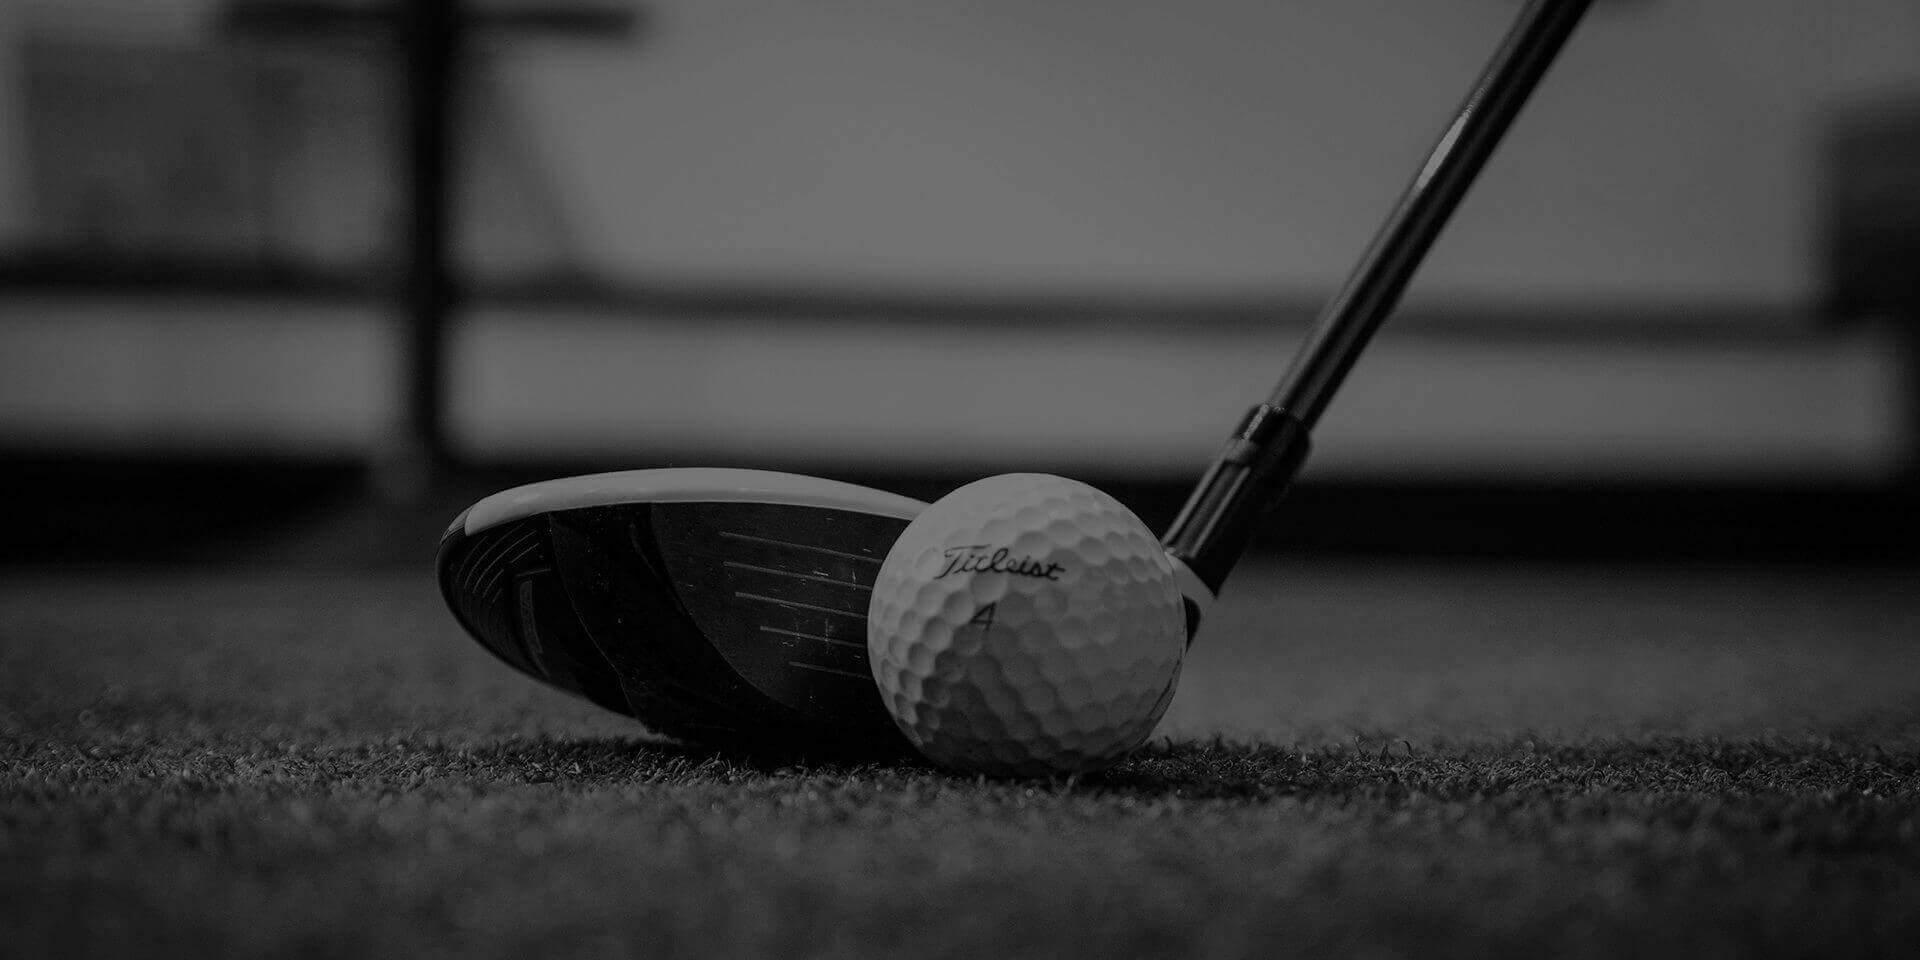 Virtual Golf Studio Leigh on Sea